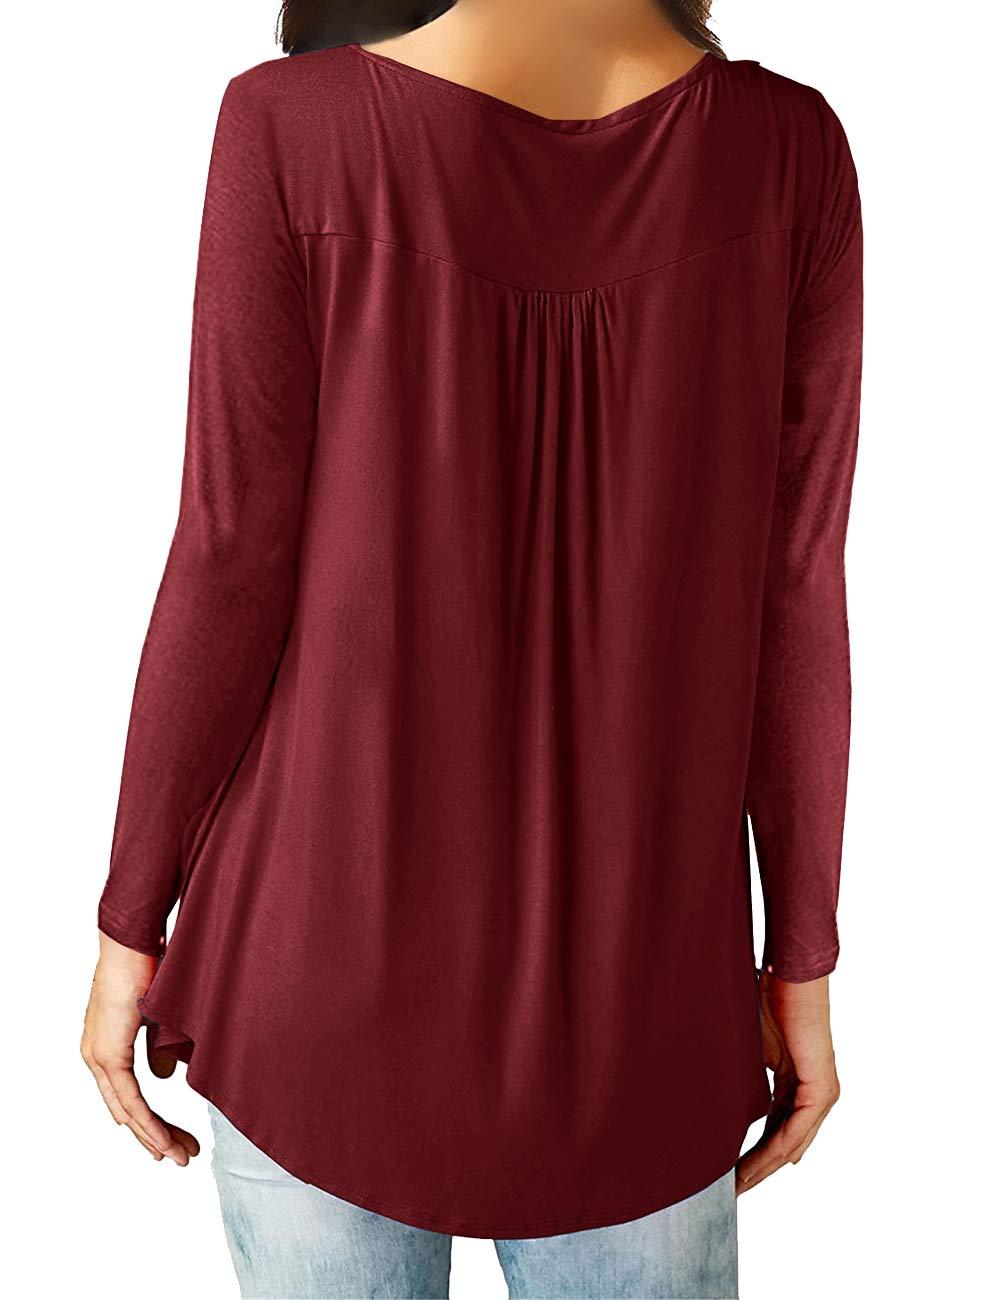 Eanklosco Camisetas Cuello en V Casual Manga Larga para Mujer (Vino Rojo, XL/ES 50-52)